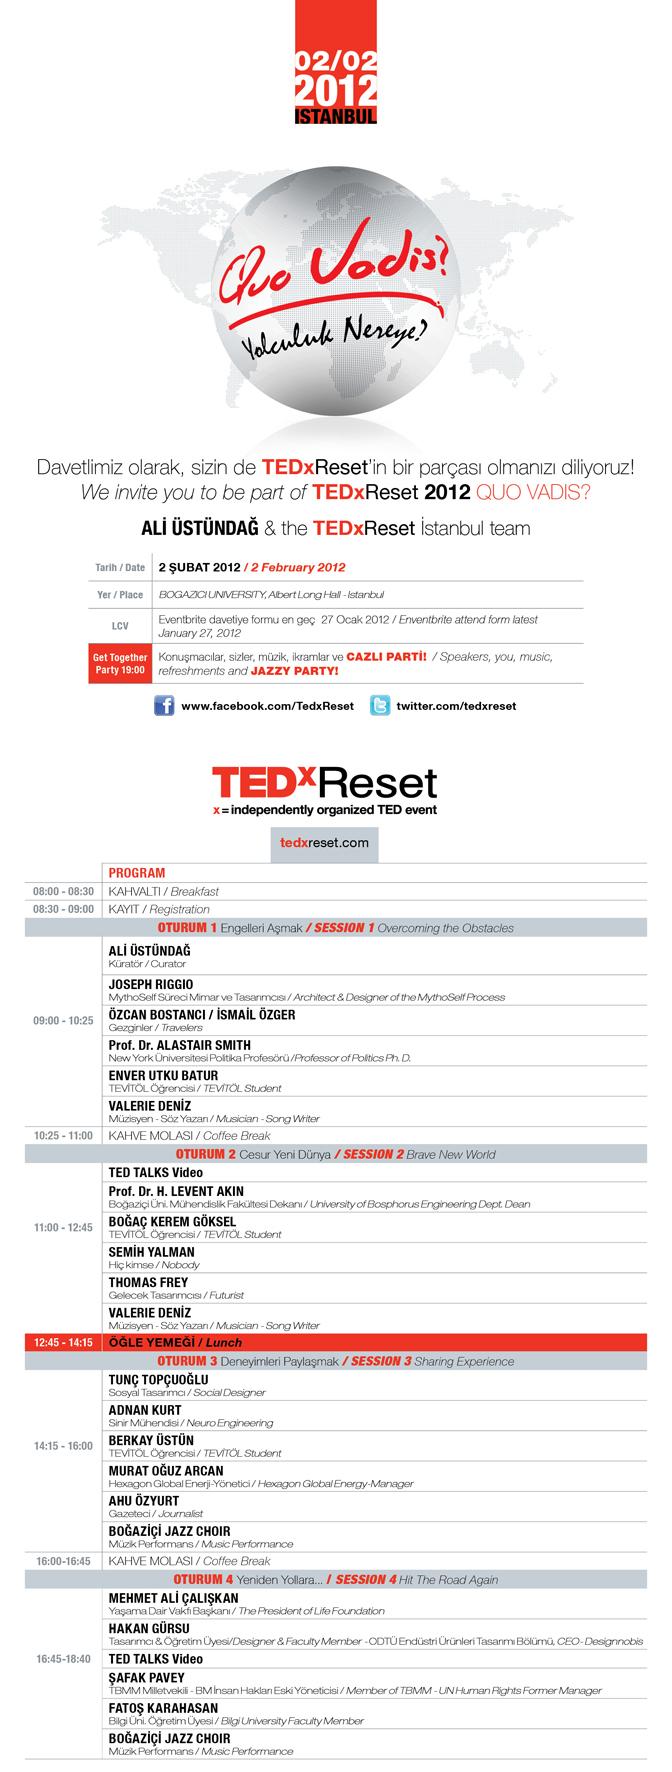 TEDxRESET 2012 YOLCULUK NEREYE - QUO VADIS?